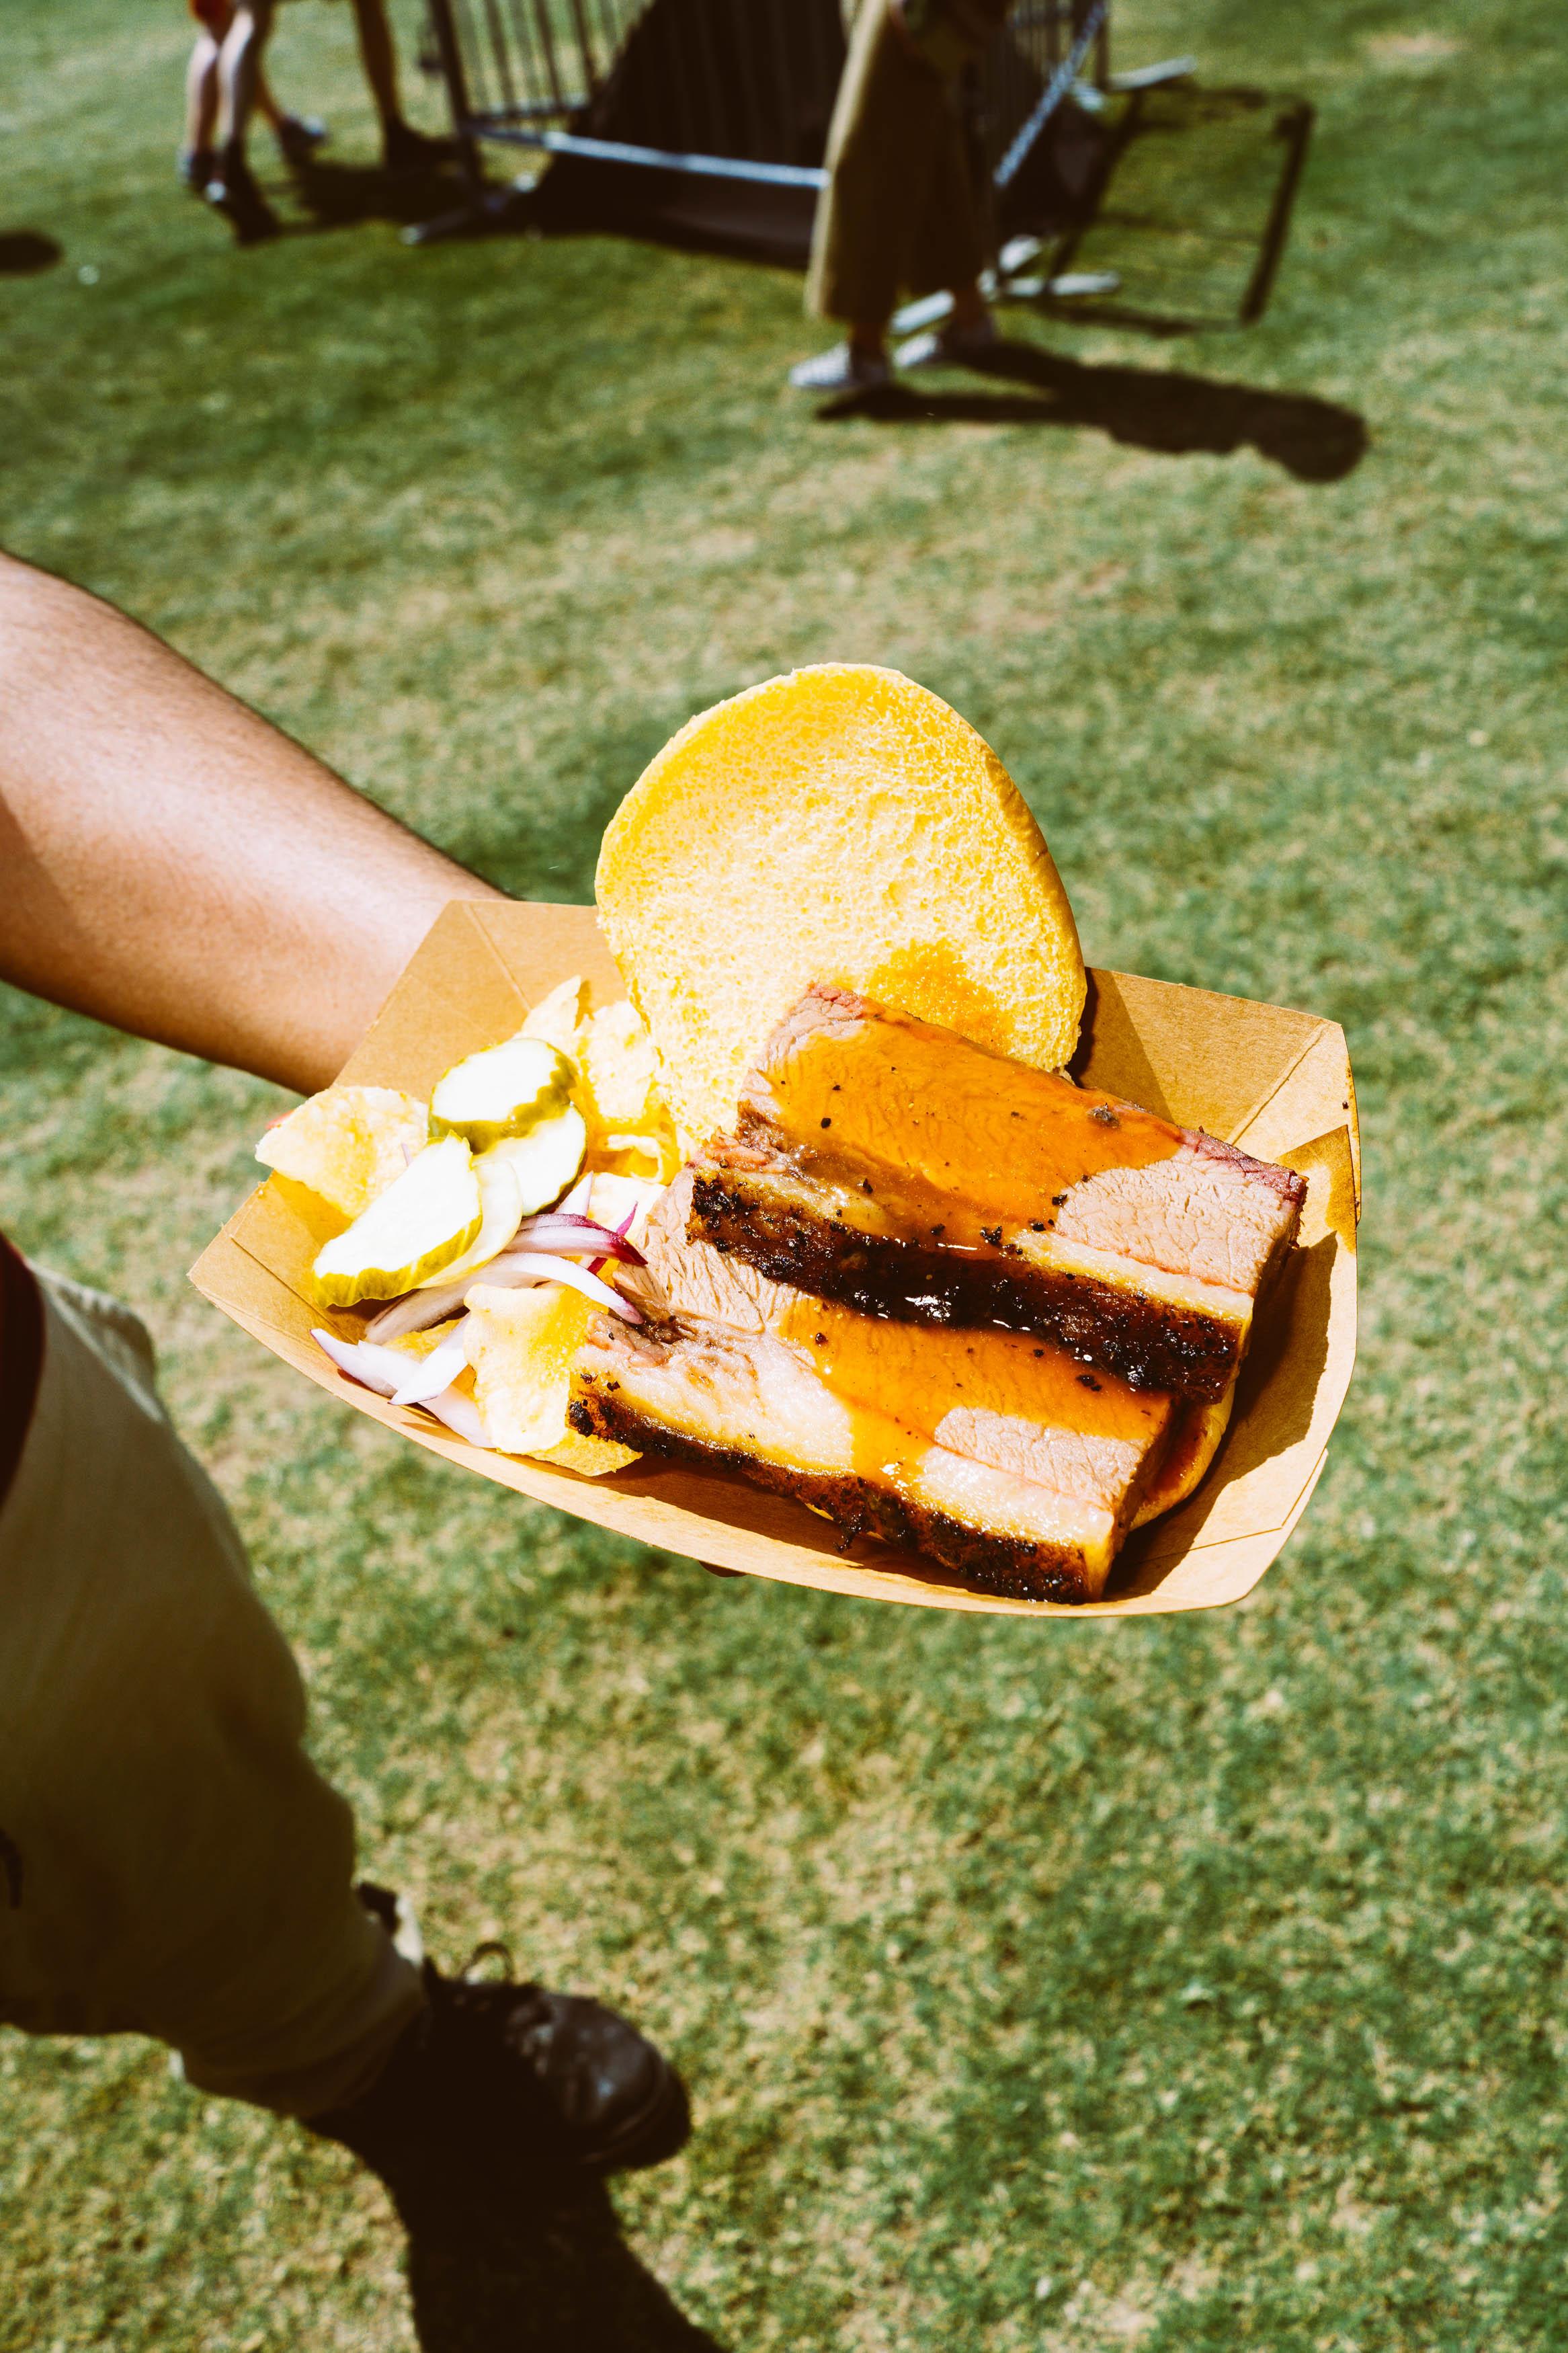 The brisket sandwich from Micklethwait Craft Meats